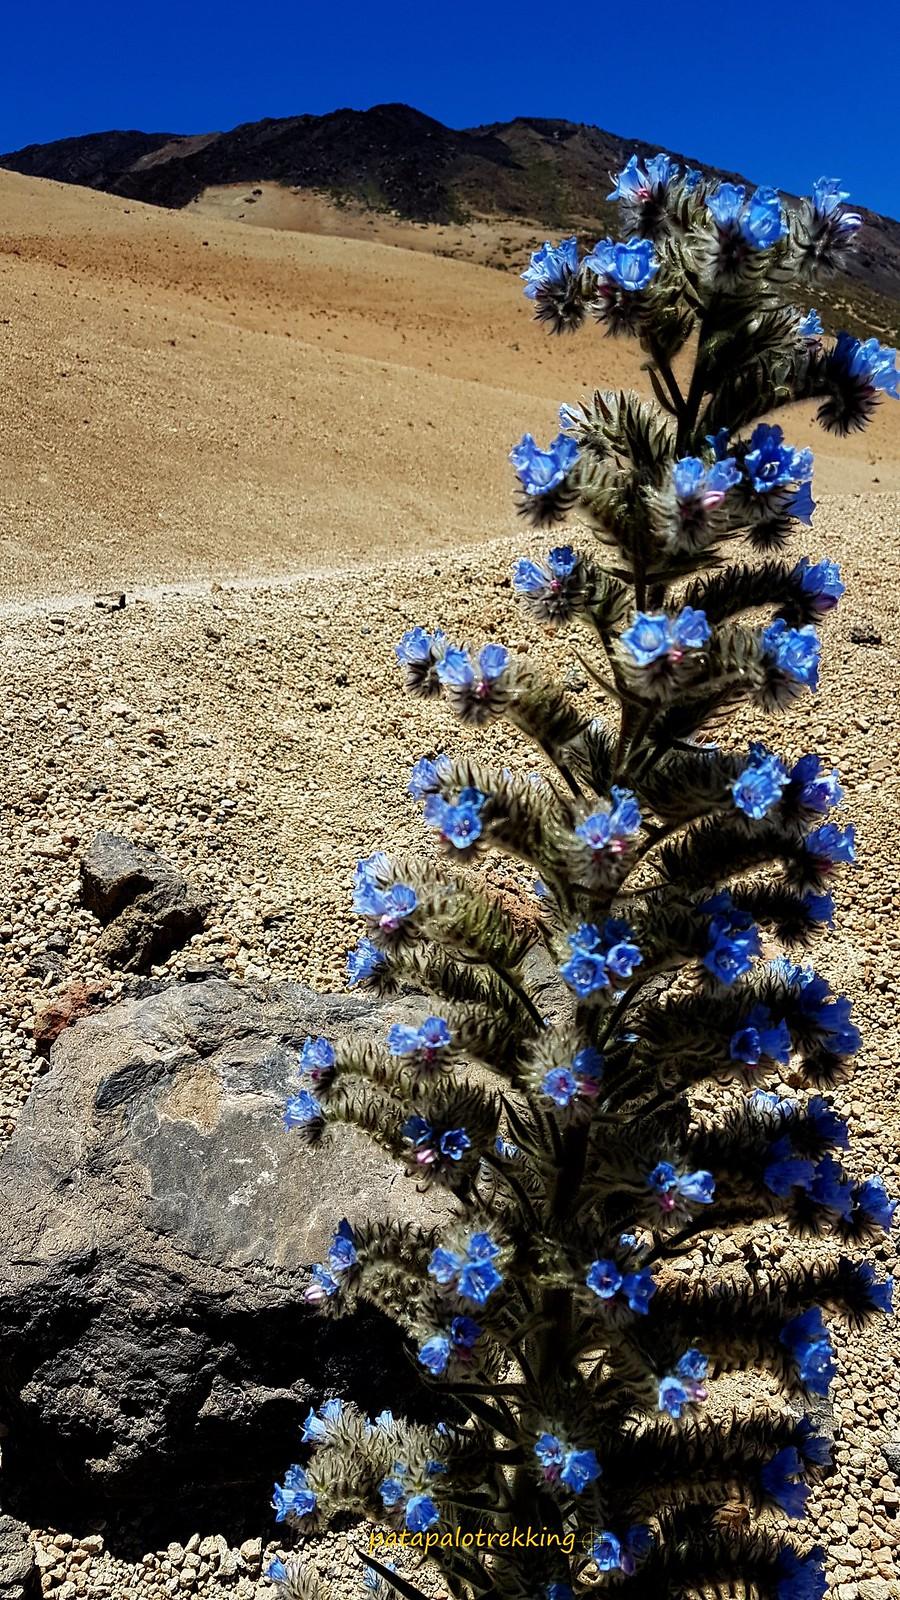 6a Tajinaste azul del Teide